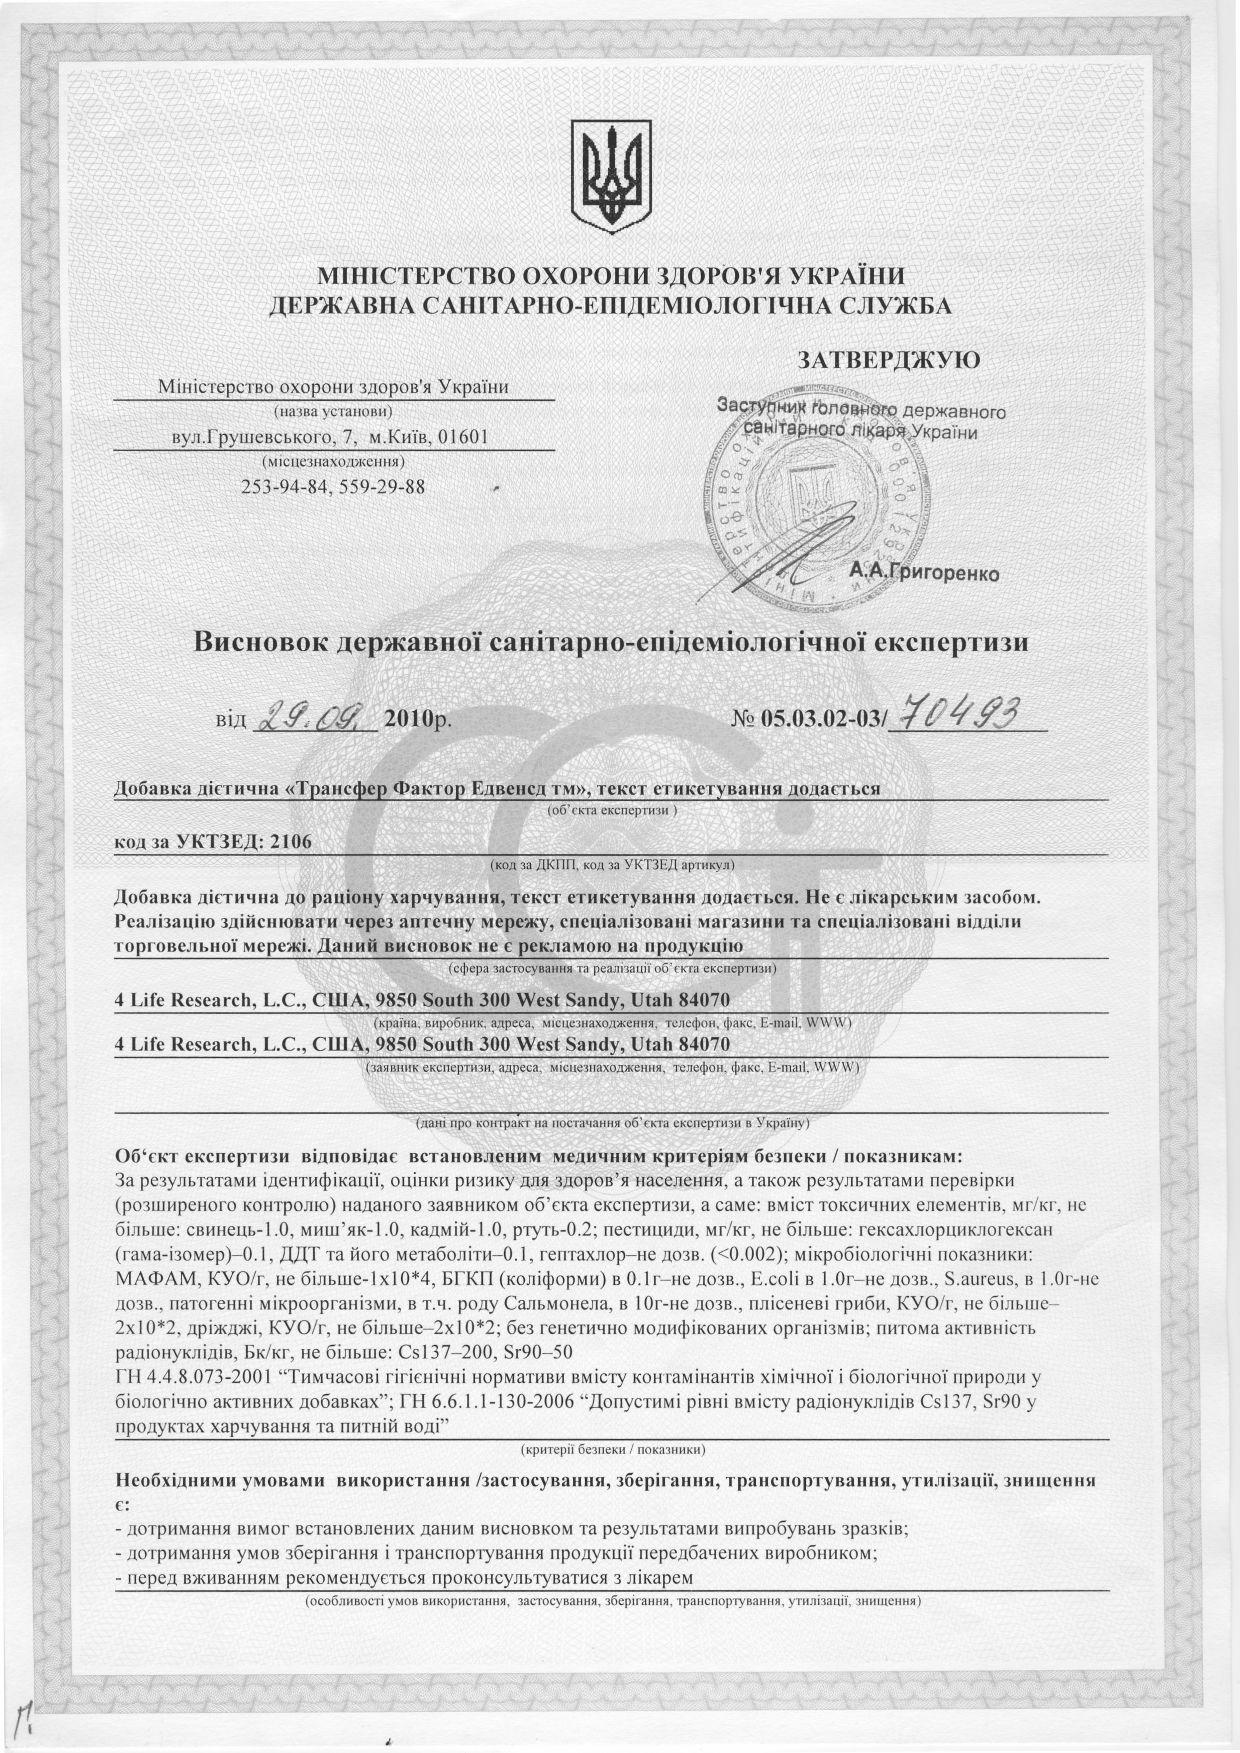 Сертификат Трансфер-фактор эдвенсд, лист 1